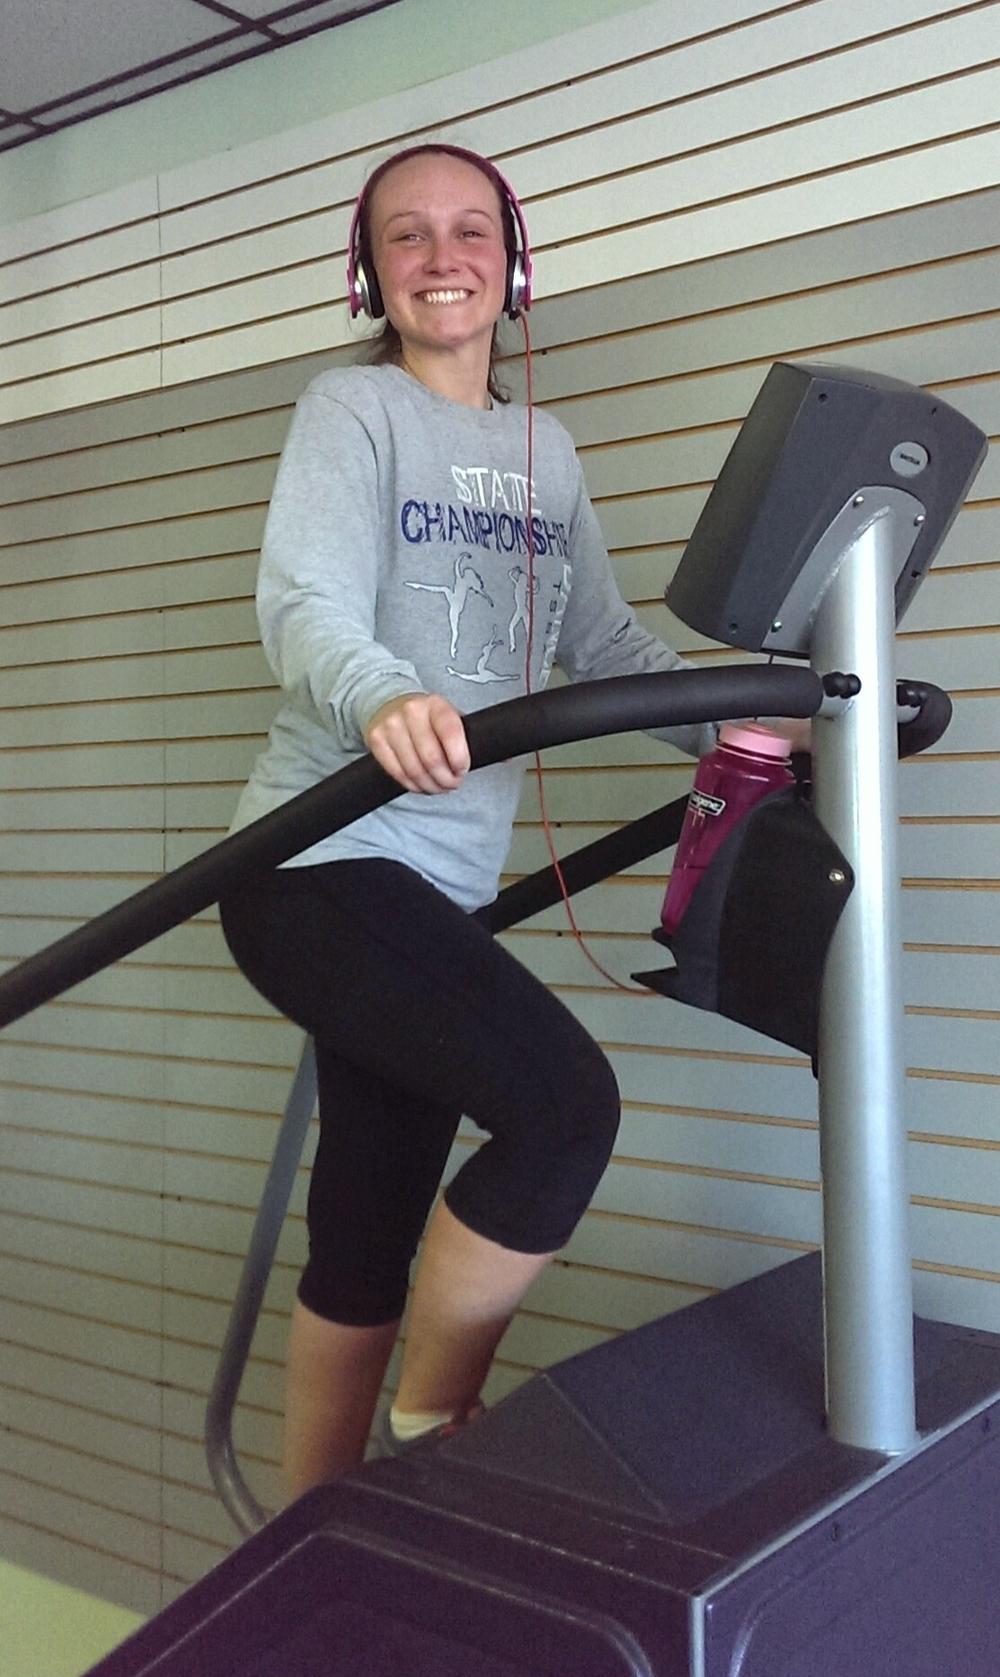 Girl on Stepmill.jpg